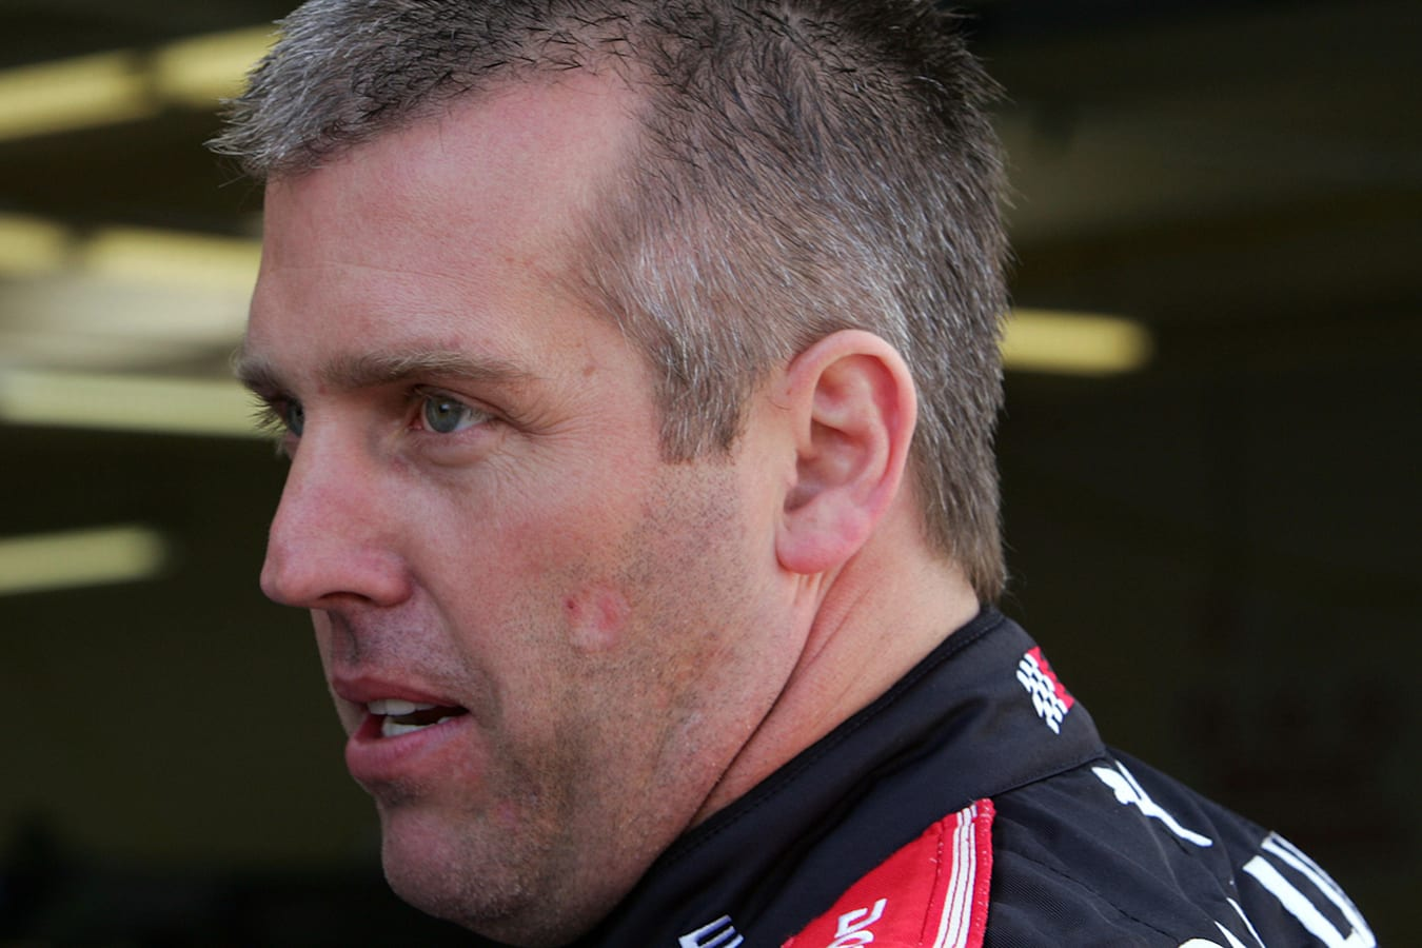 Motorsport Jeremy Mayfield Jpg